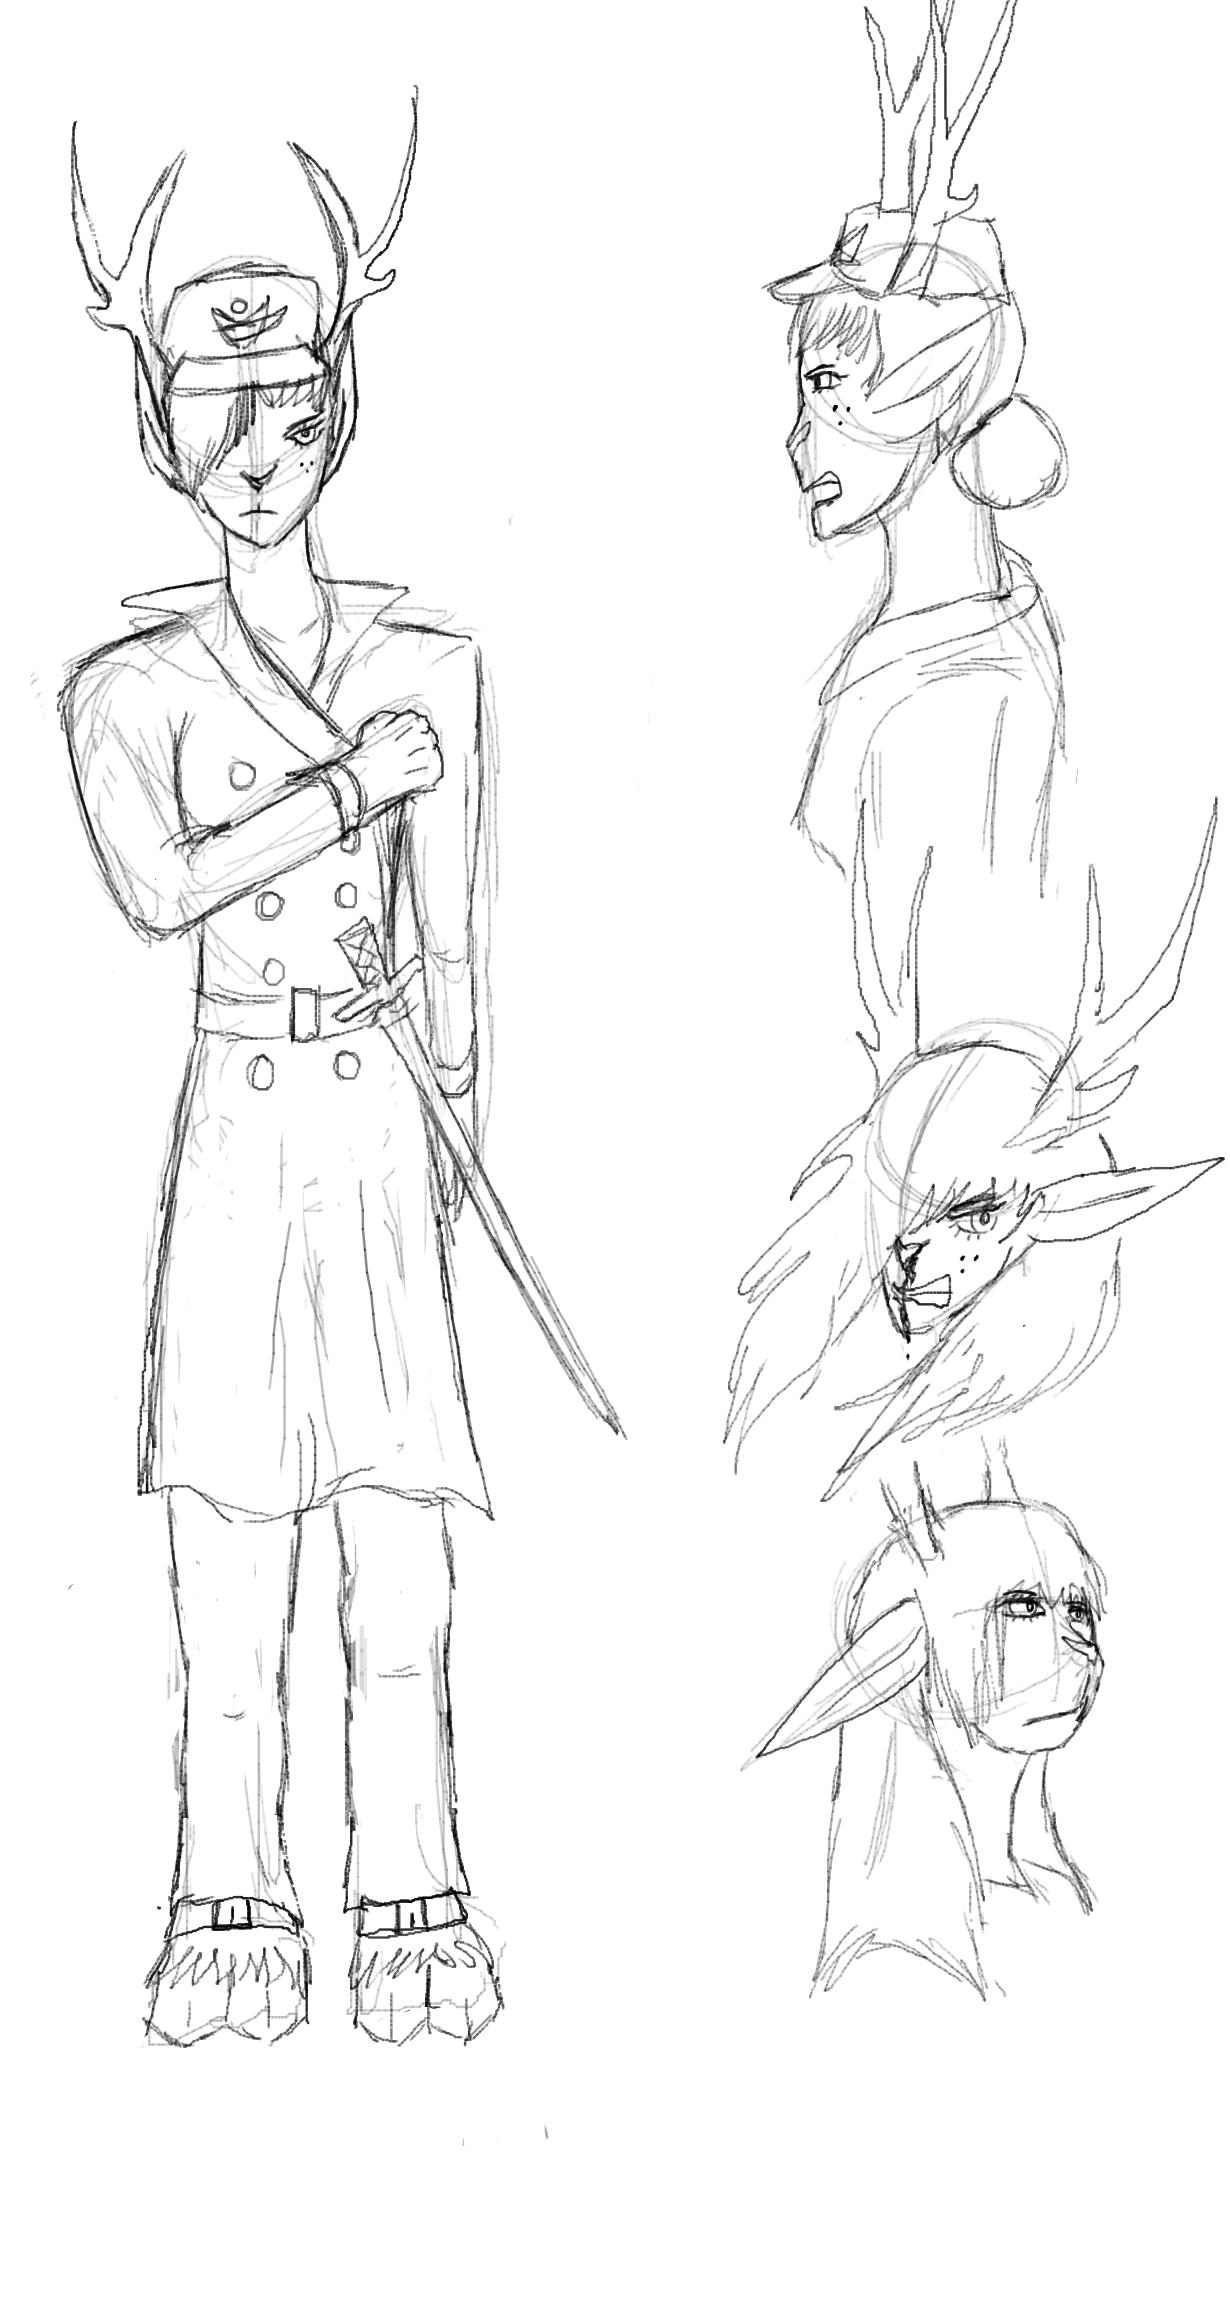 02-Officer deer lady